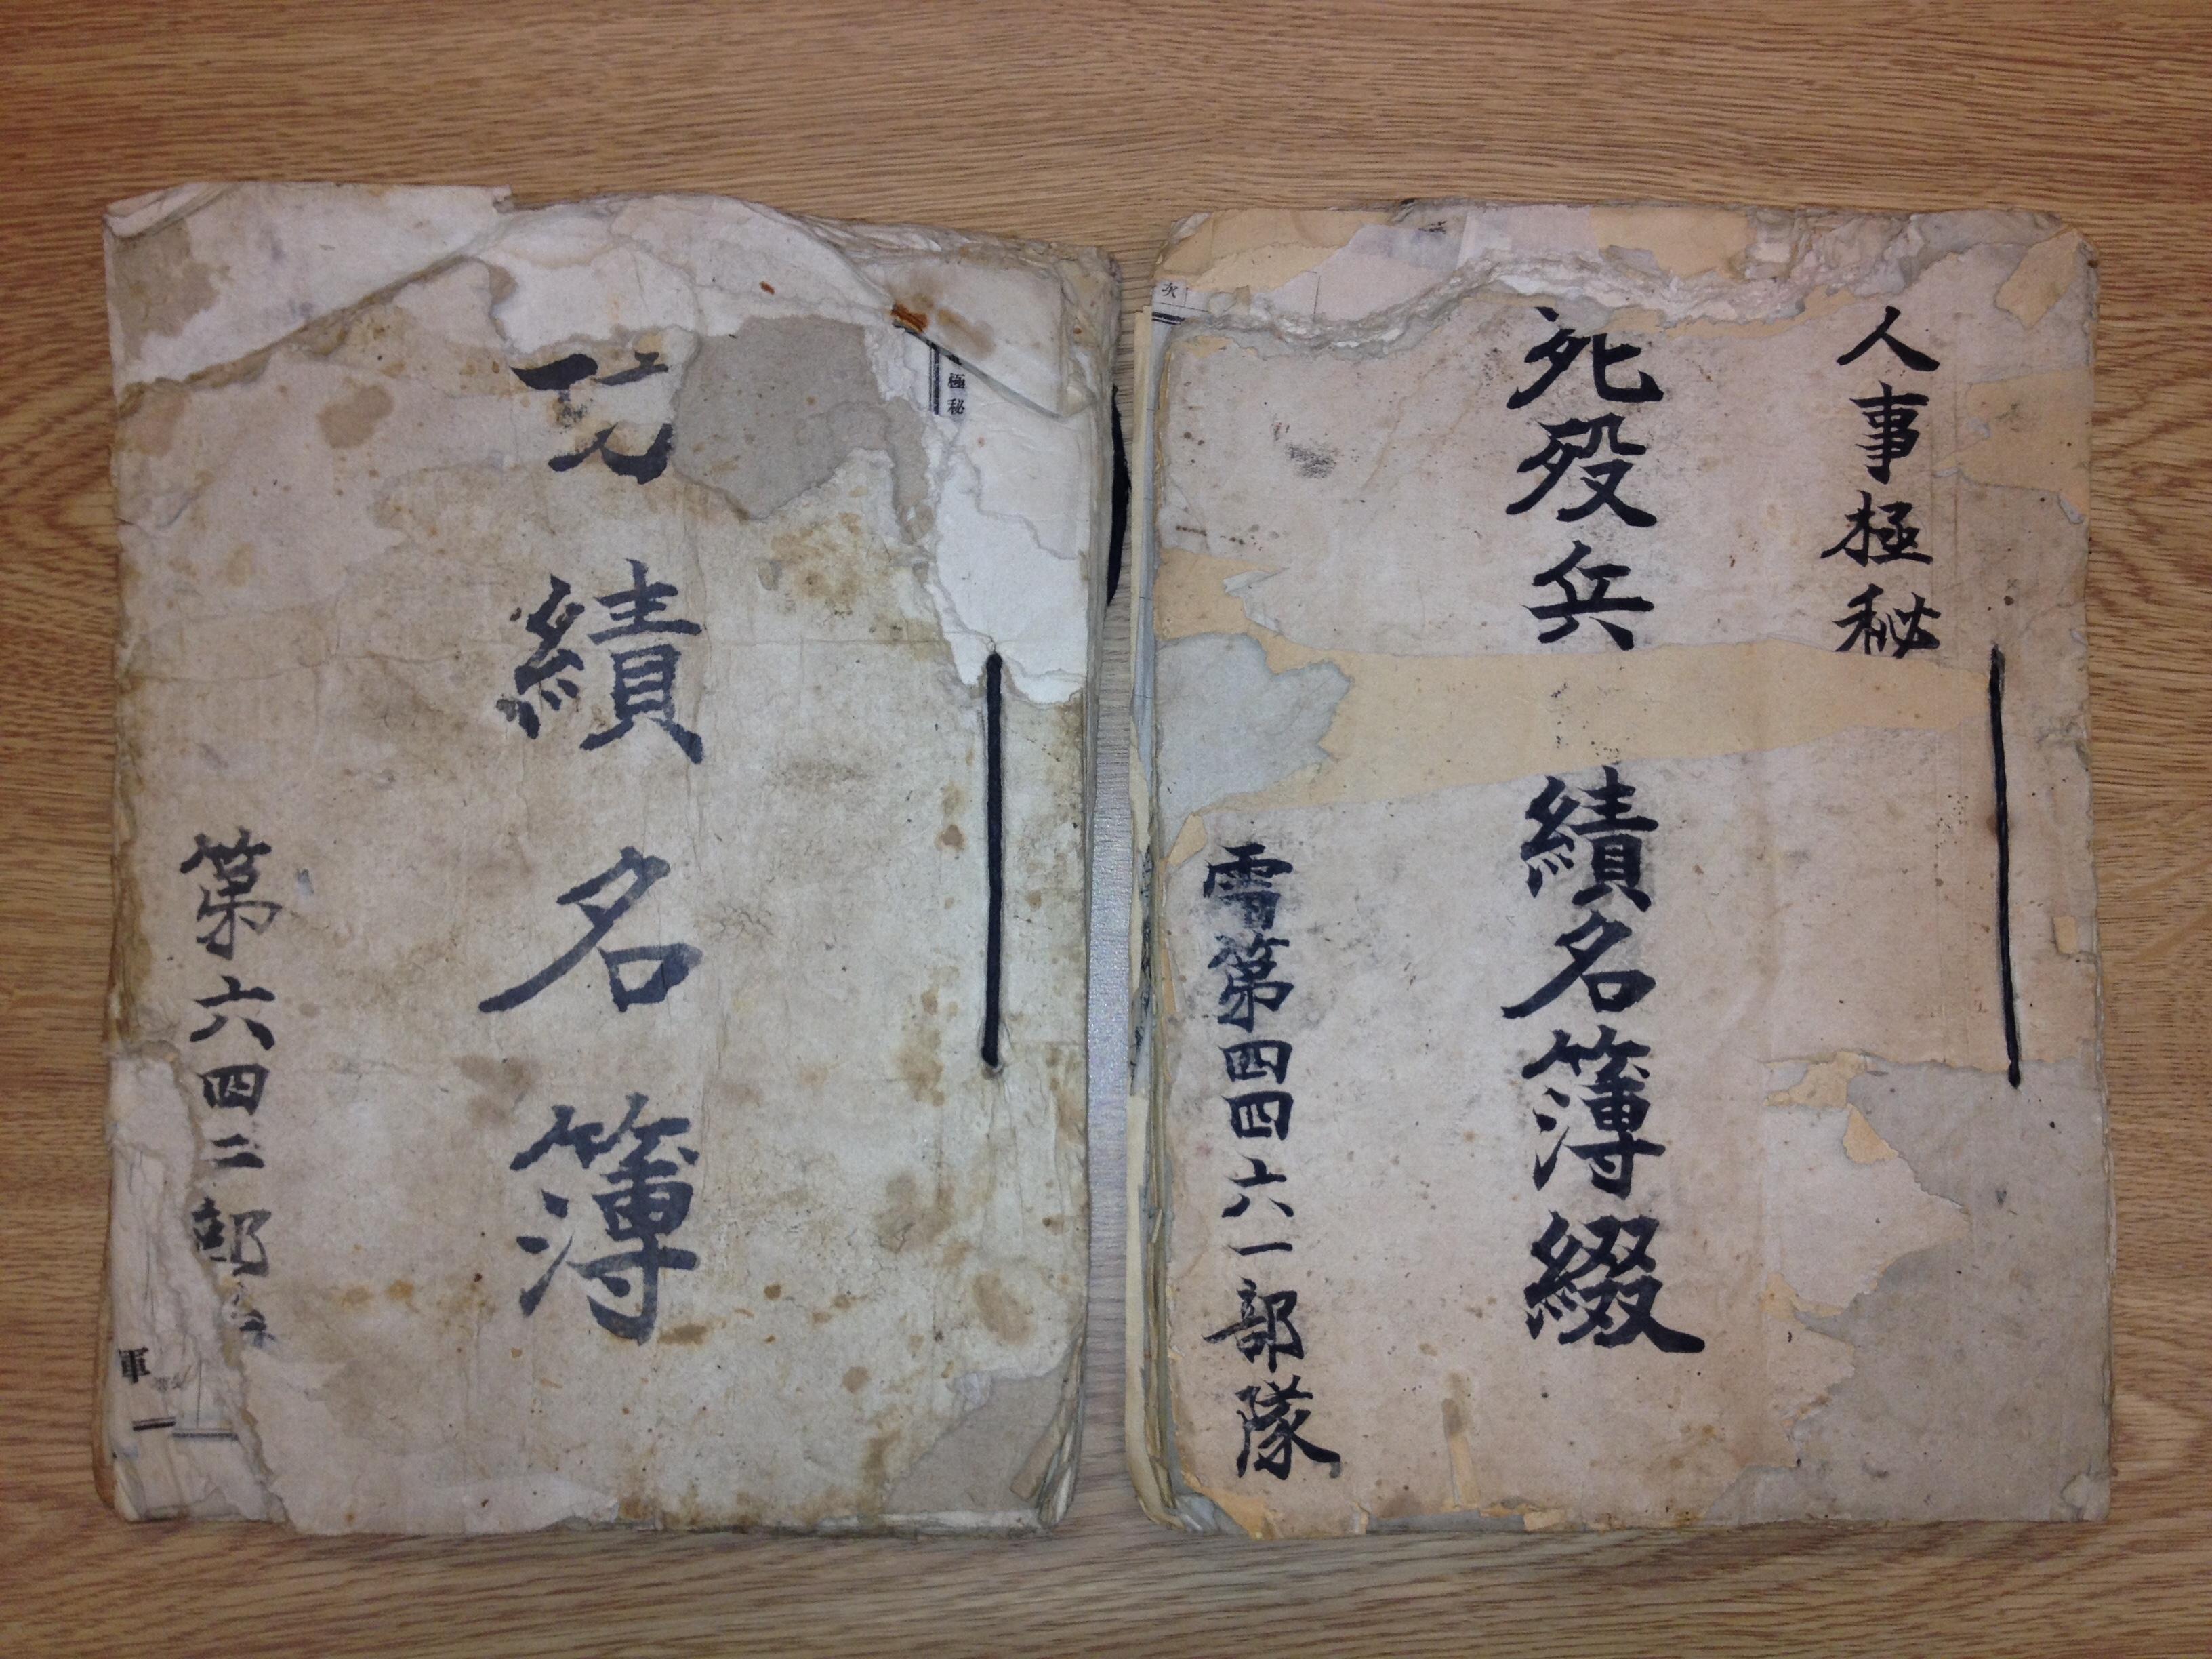 Japanese military documents. Invasion of Manchuria. 1931